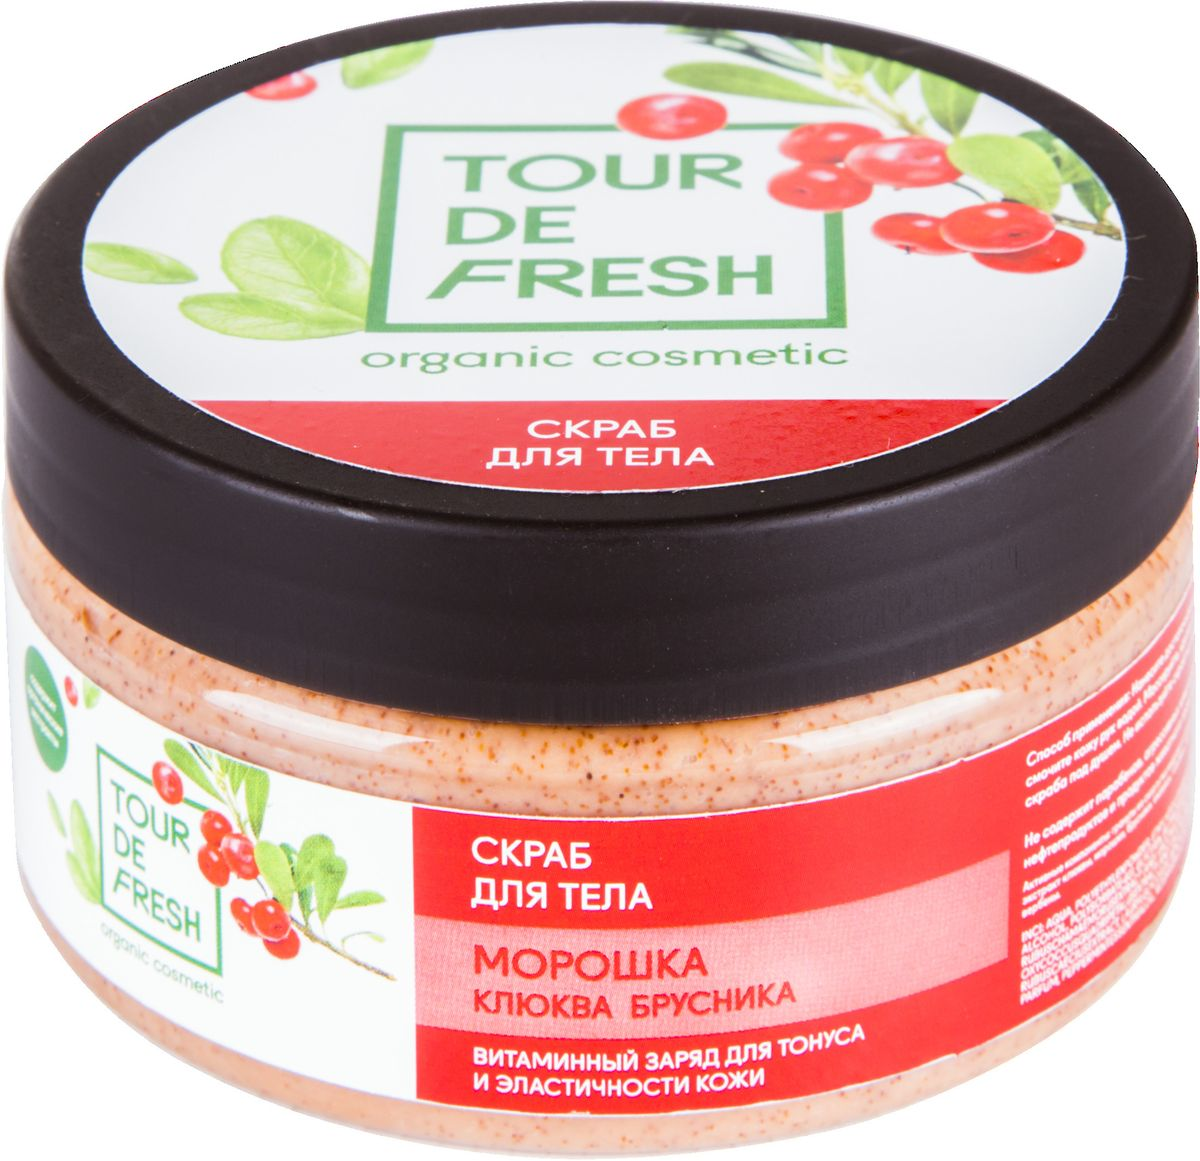 Tour De Fresh Скраб для тела Клюква, морошка и брусника, 200 мл - Косметика по уходу за кожей